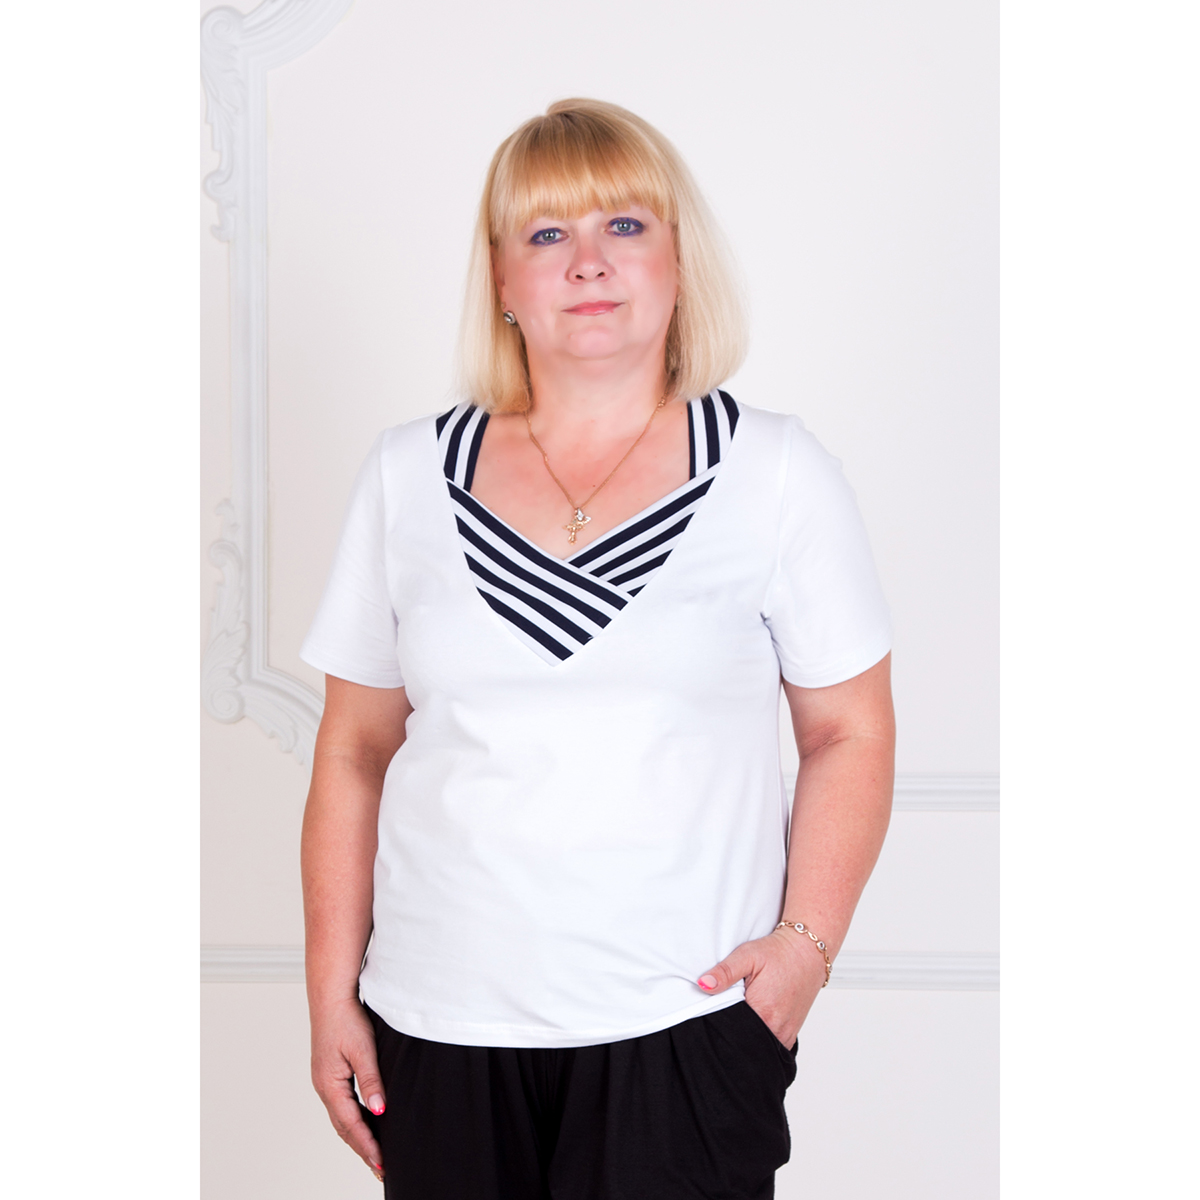 Женская блуза Аманда, размер 58Блузки, майки, кофты<br>Обхват груди:116 см<br>Обхват талии:97 см<br>Обхват бедер:124 см<br>Рост:167 см<br><br>Тип: Жен. блуза<br>Размер: 58<br>Материал: Фулайкра